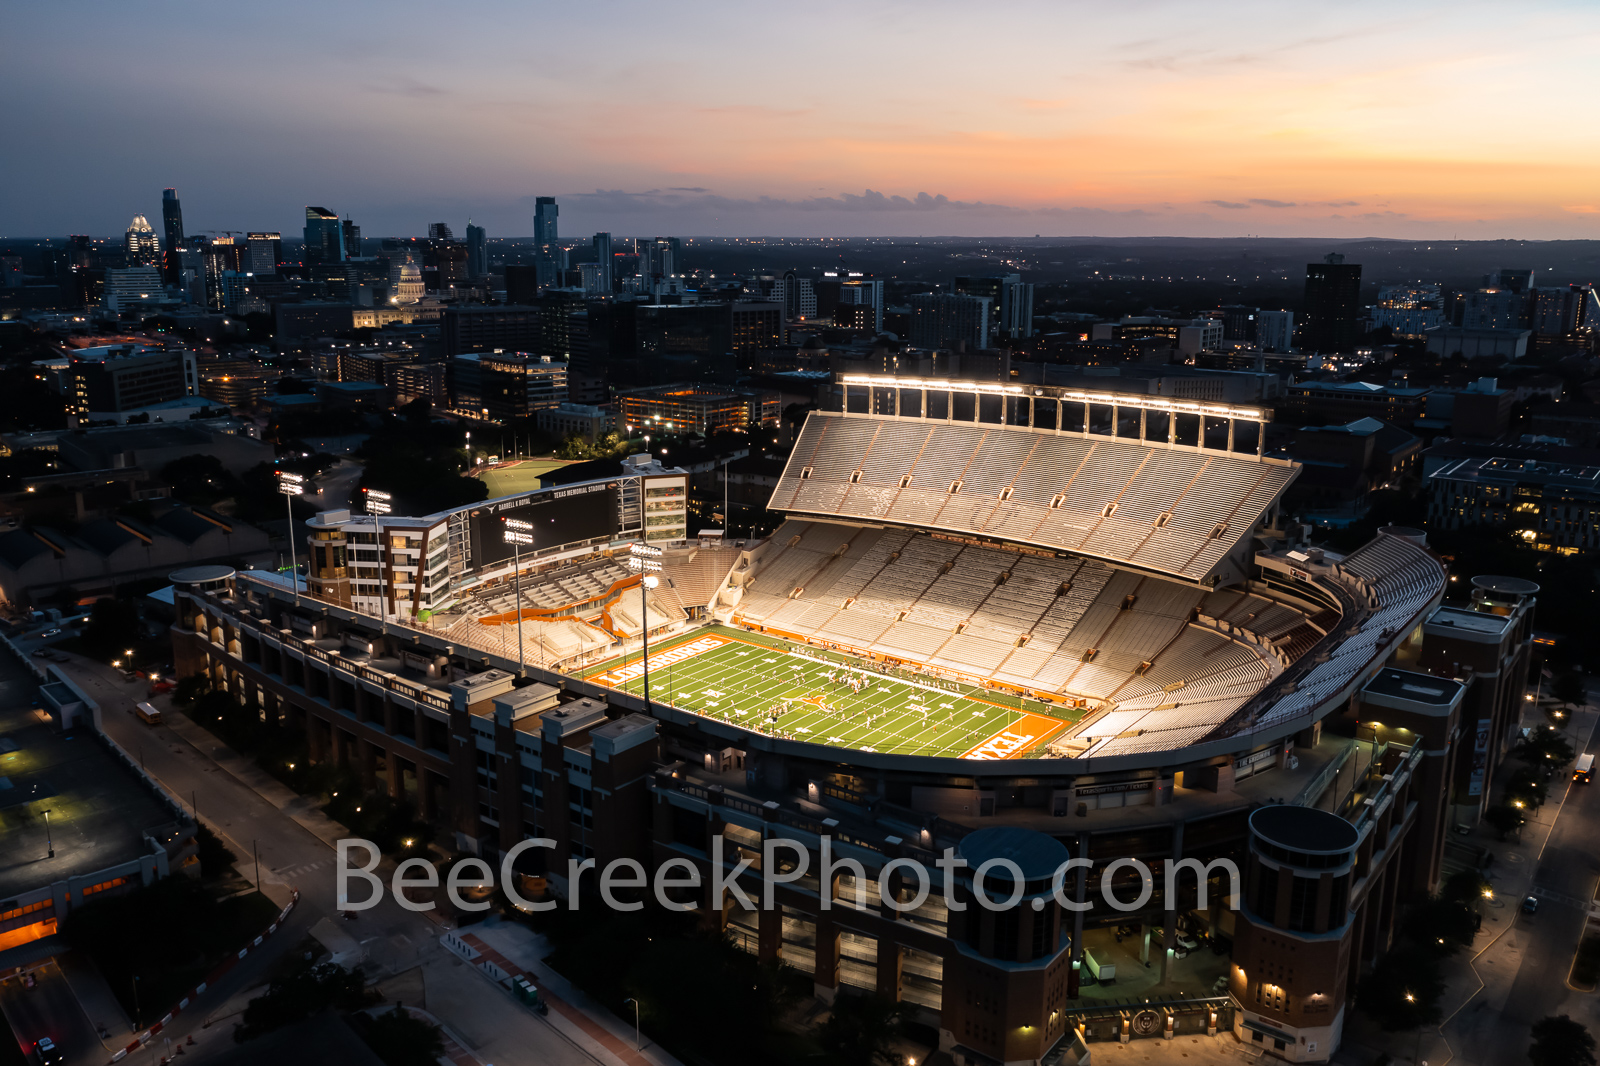 Darrell Royal -Texas Memorial Stadium at Sunset Glow  - This is an aerial capture of the Darrell K Royal Memorial Stadium in...